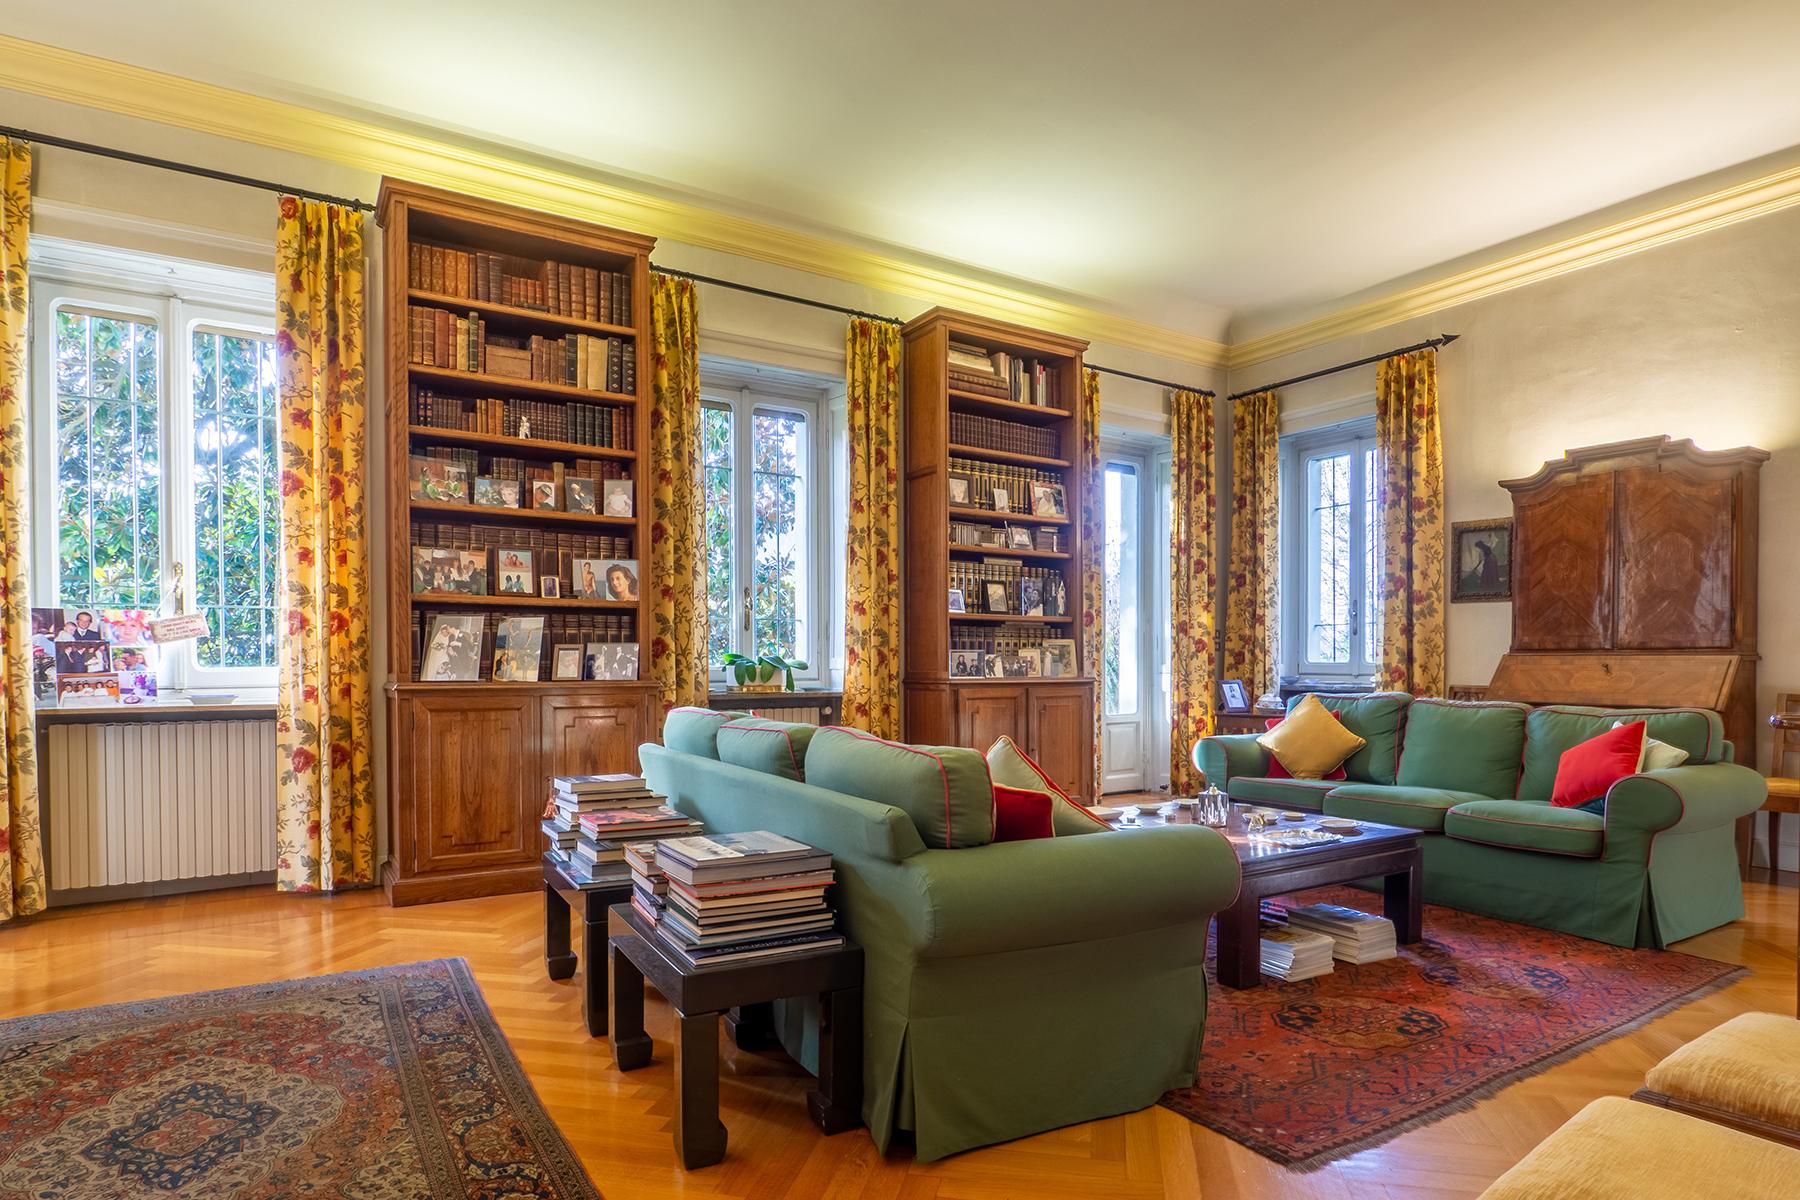 Casa indipendente in Vendita a Torino: 5 locali, 657 mq - Foto 7